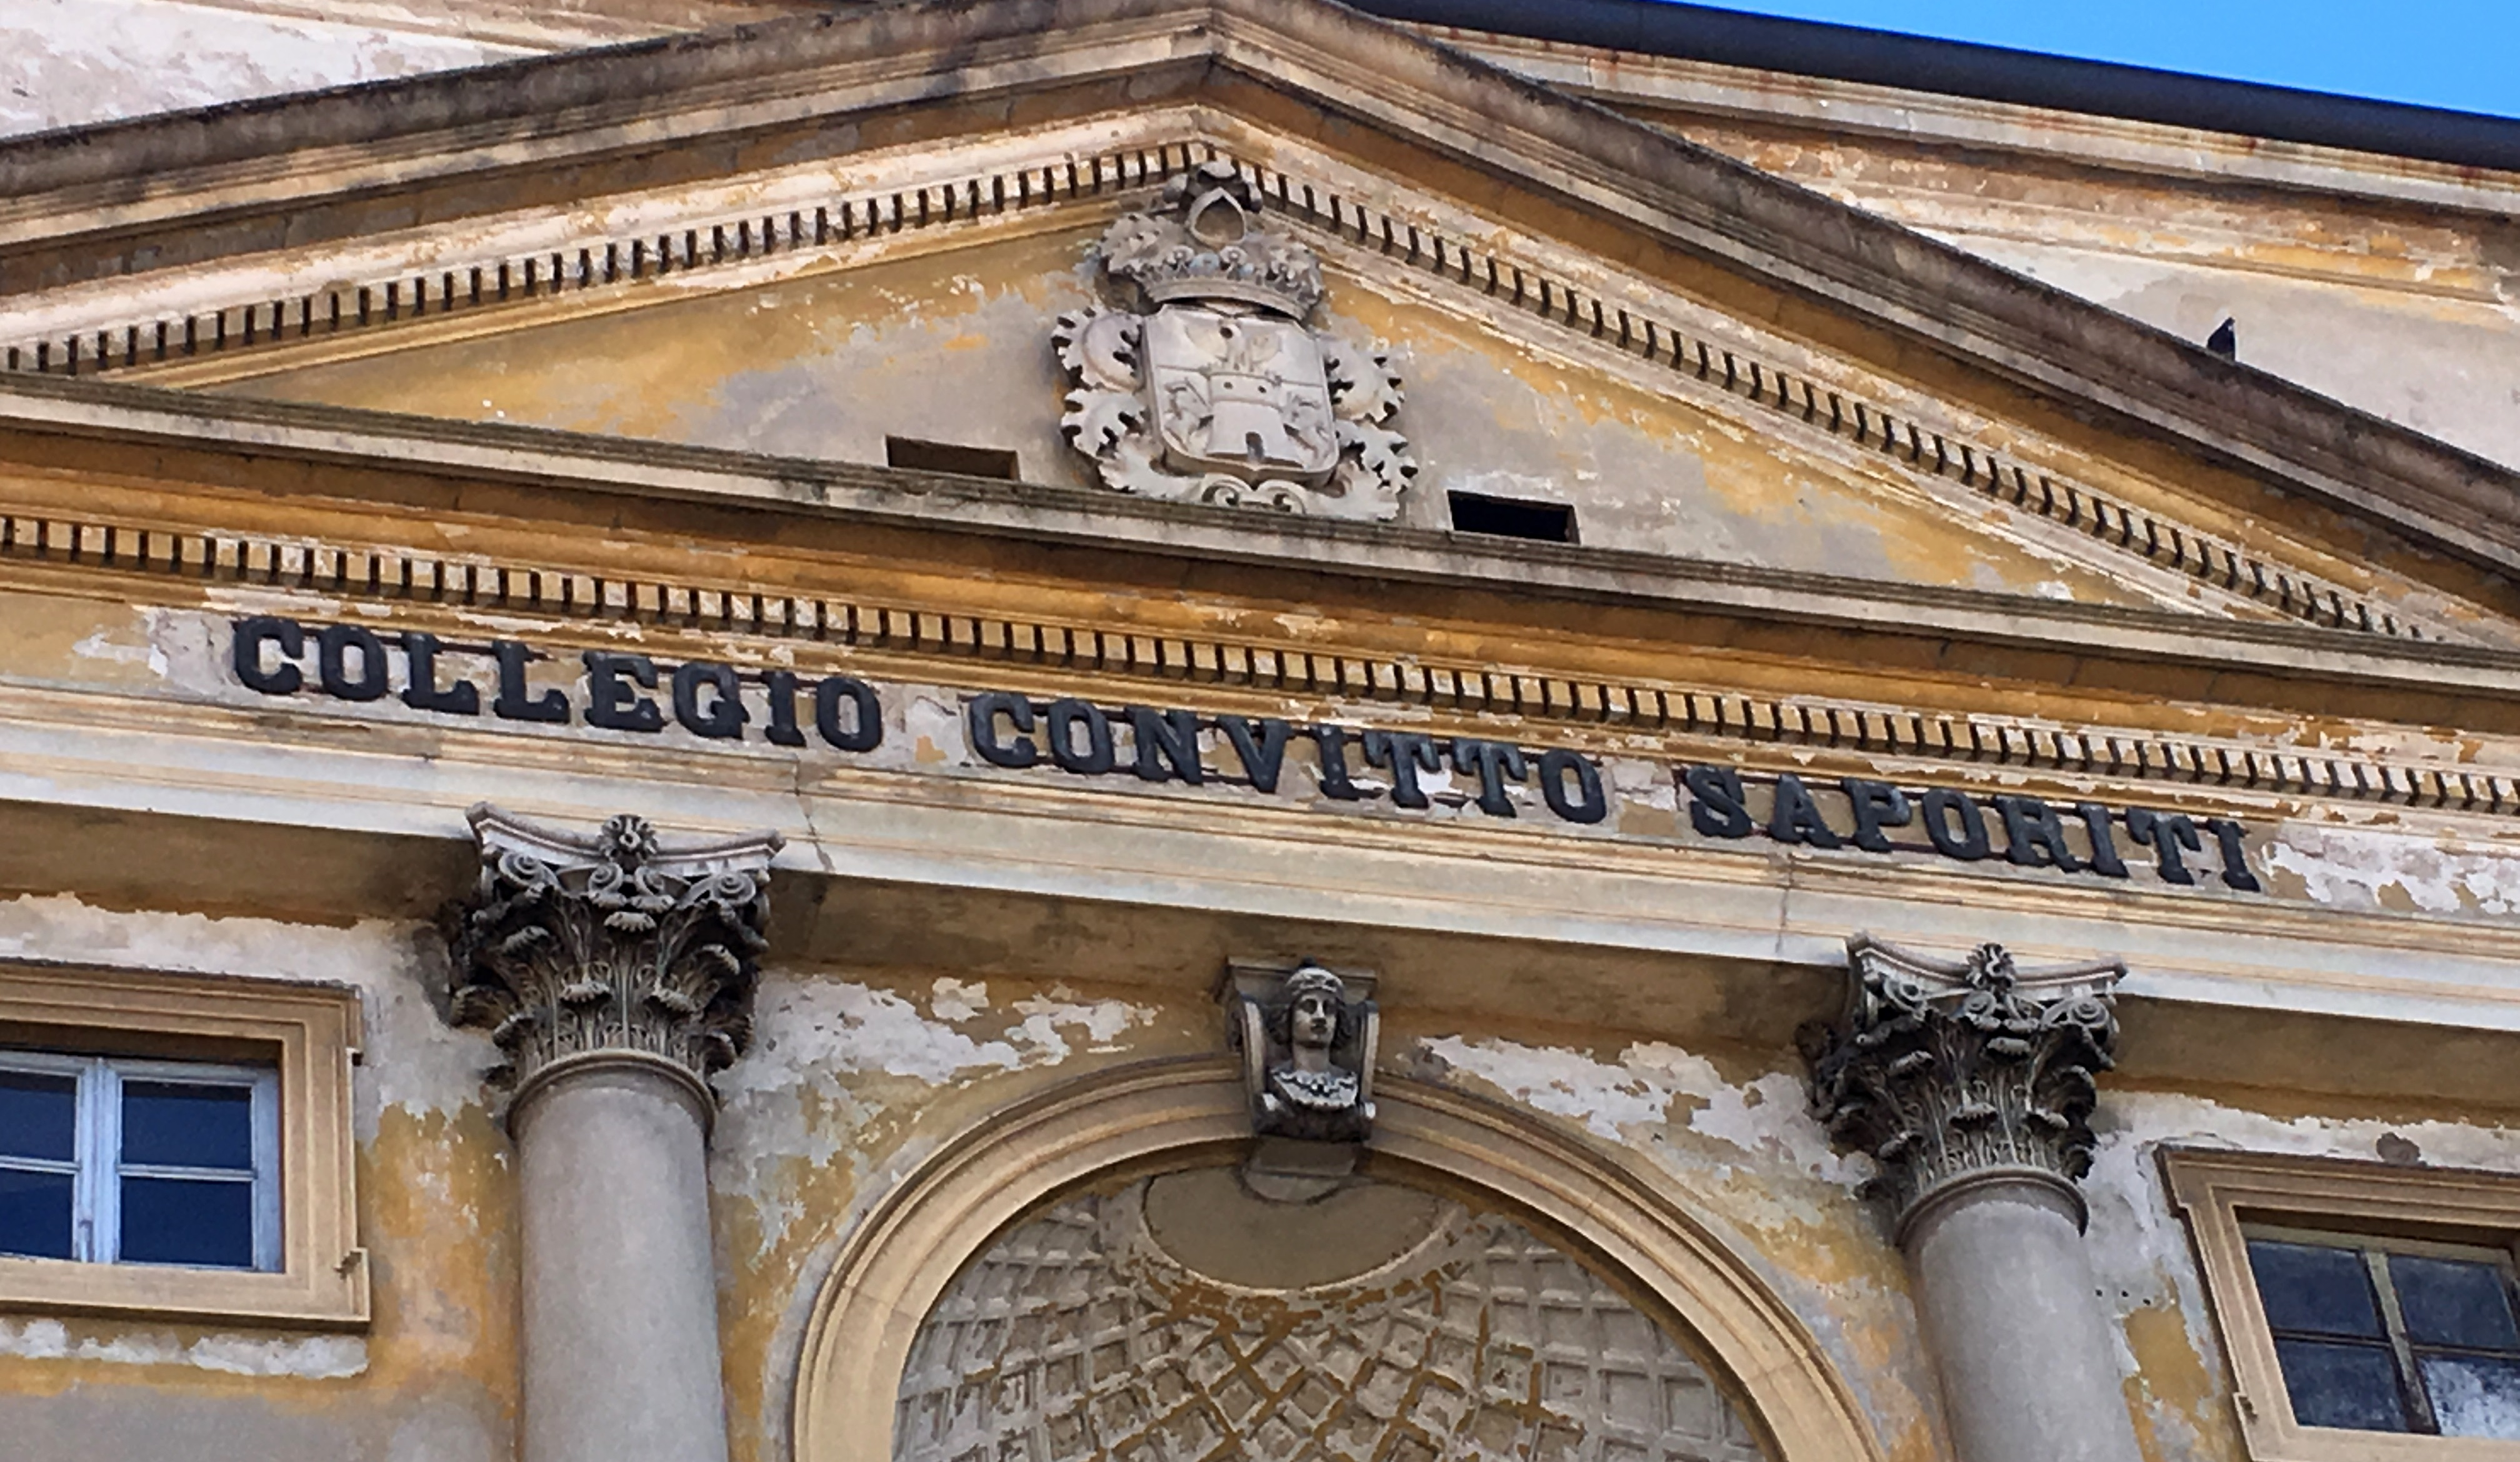 Colegio Convitto Saporiti en Vigevano, Italia.